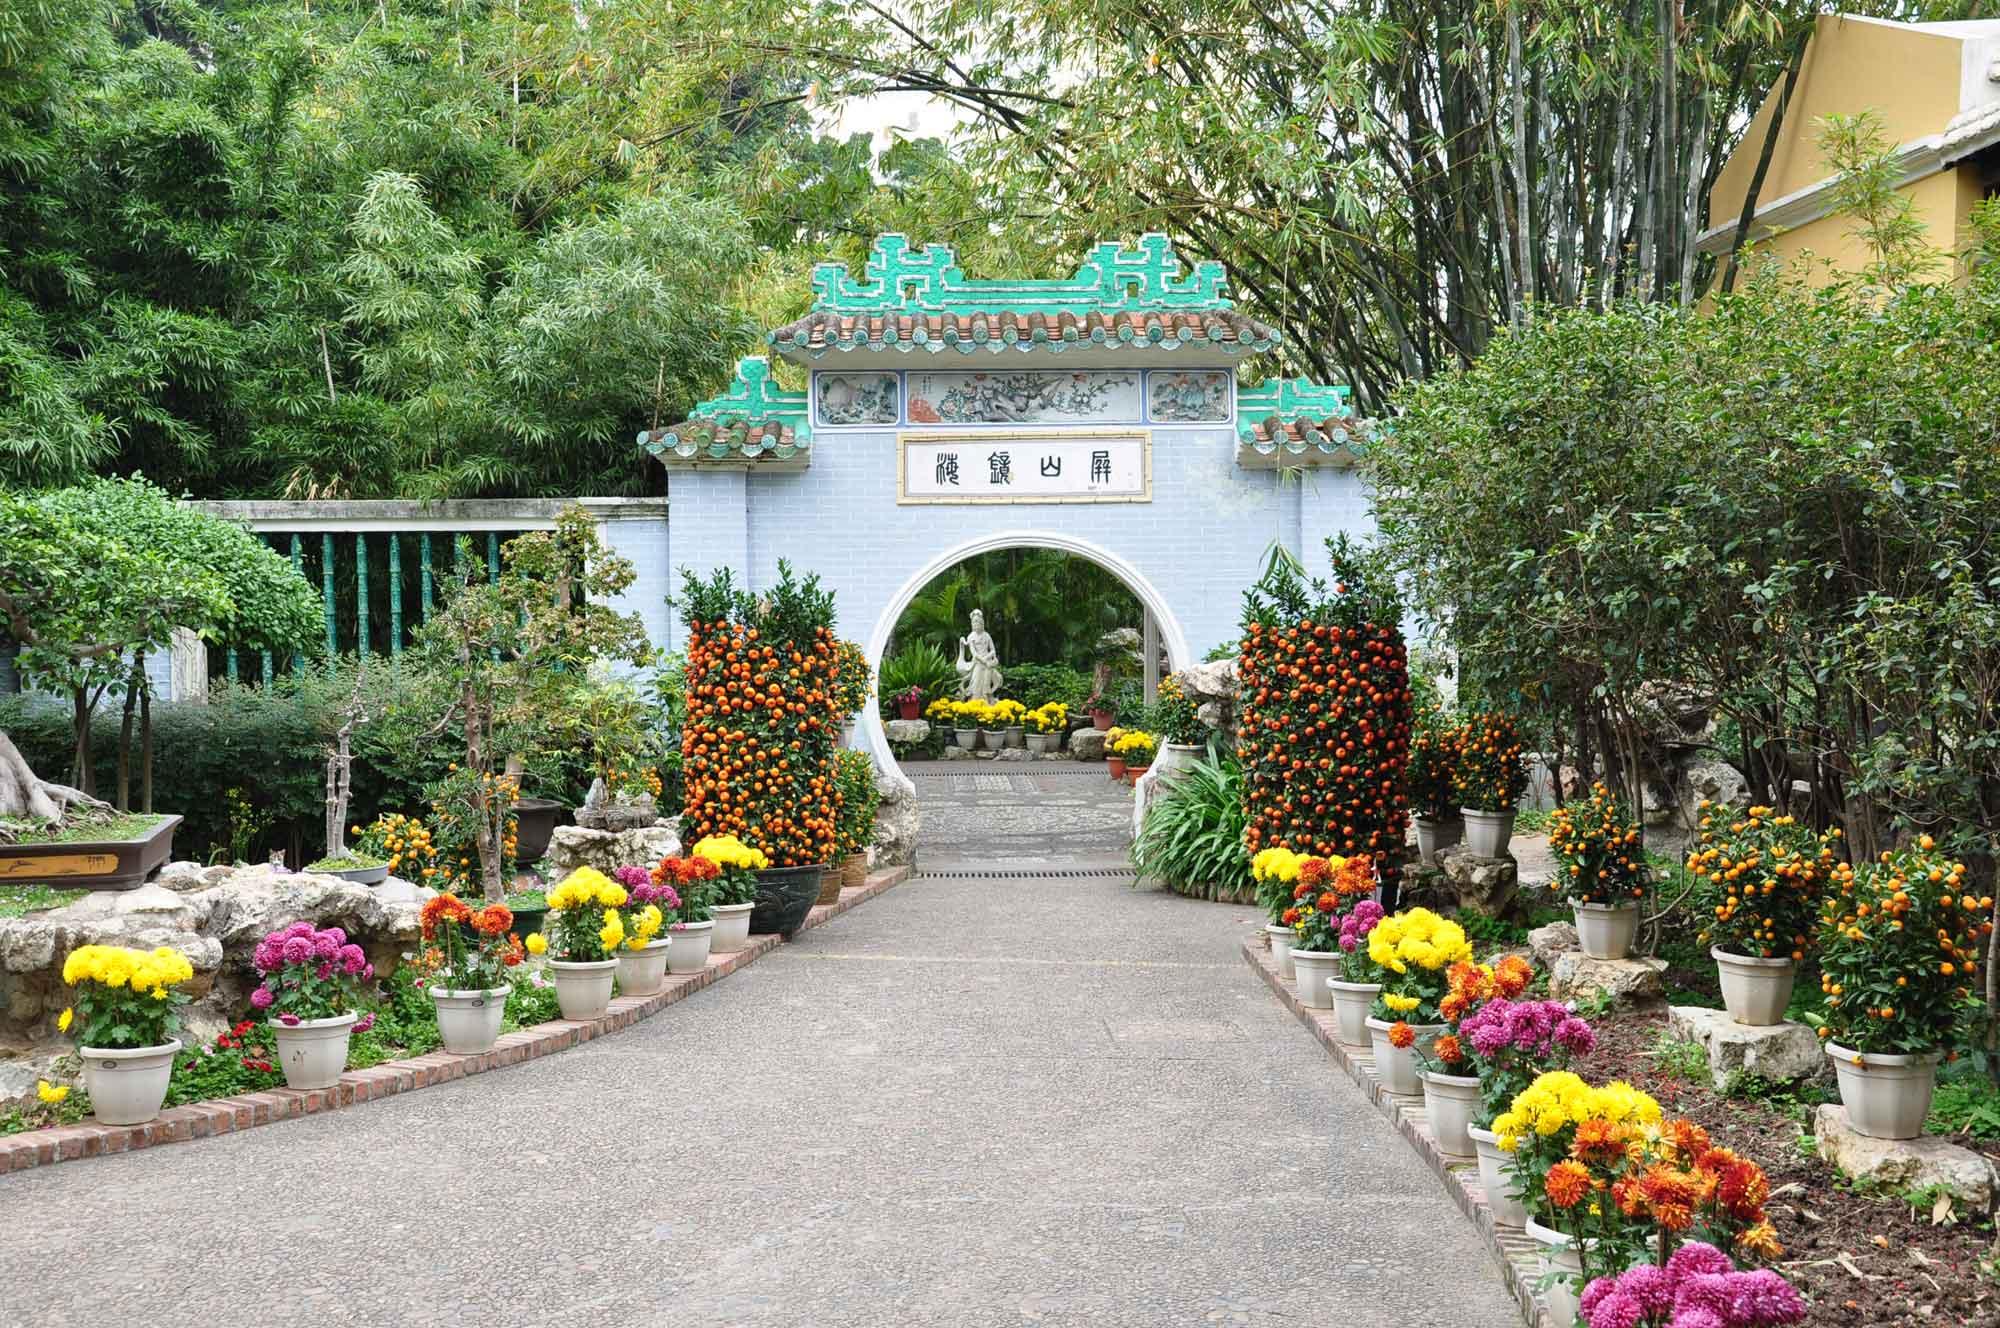 Macau Parks: Lou Lim Ieoc Garden